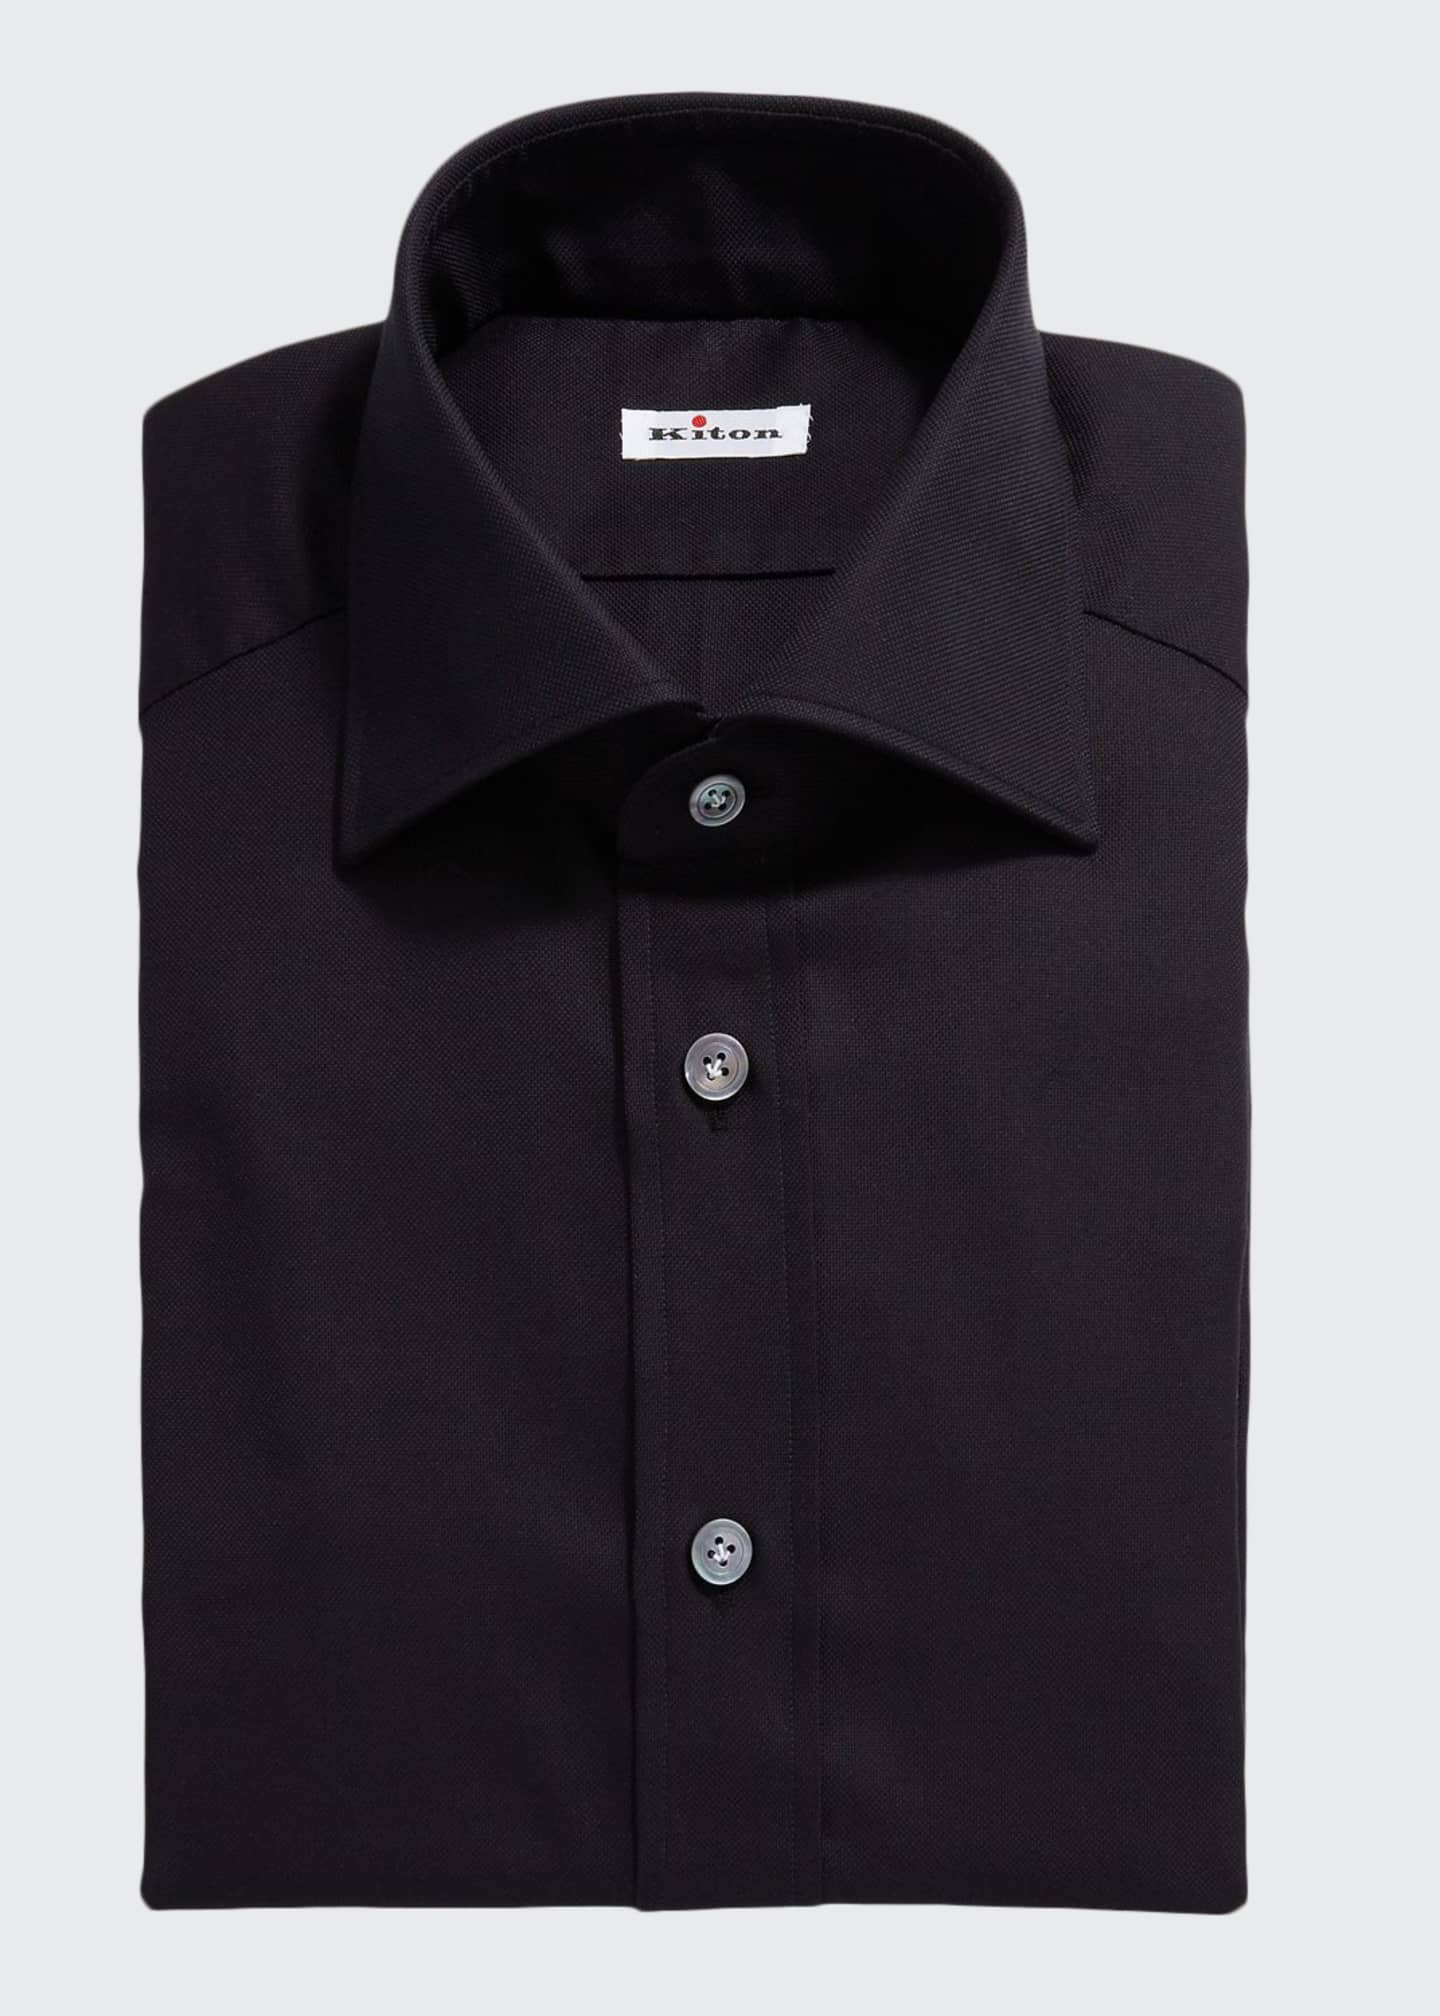 Kiton Men's Solid Oxford Dress Shirt